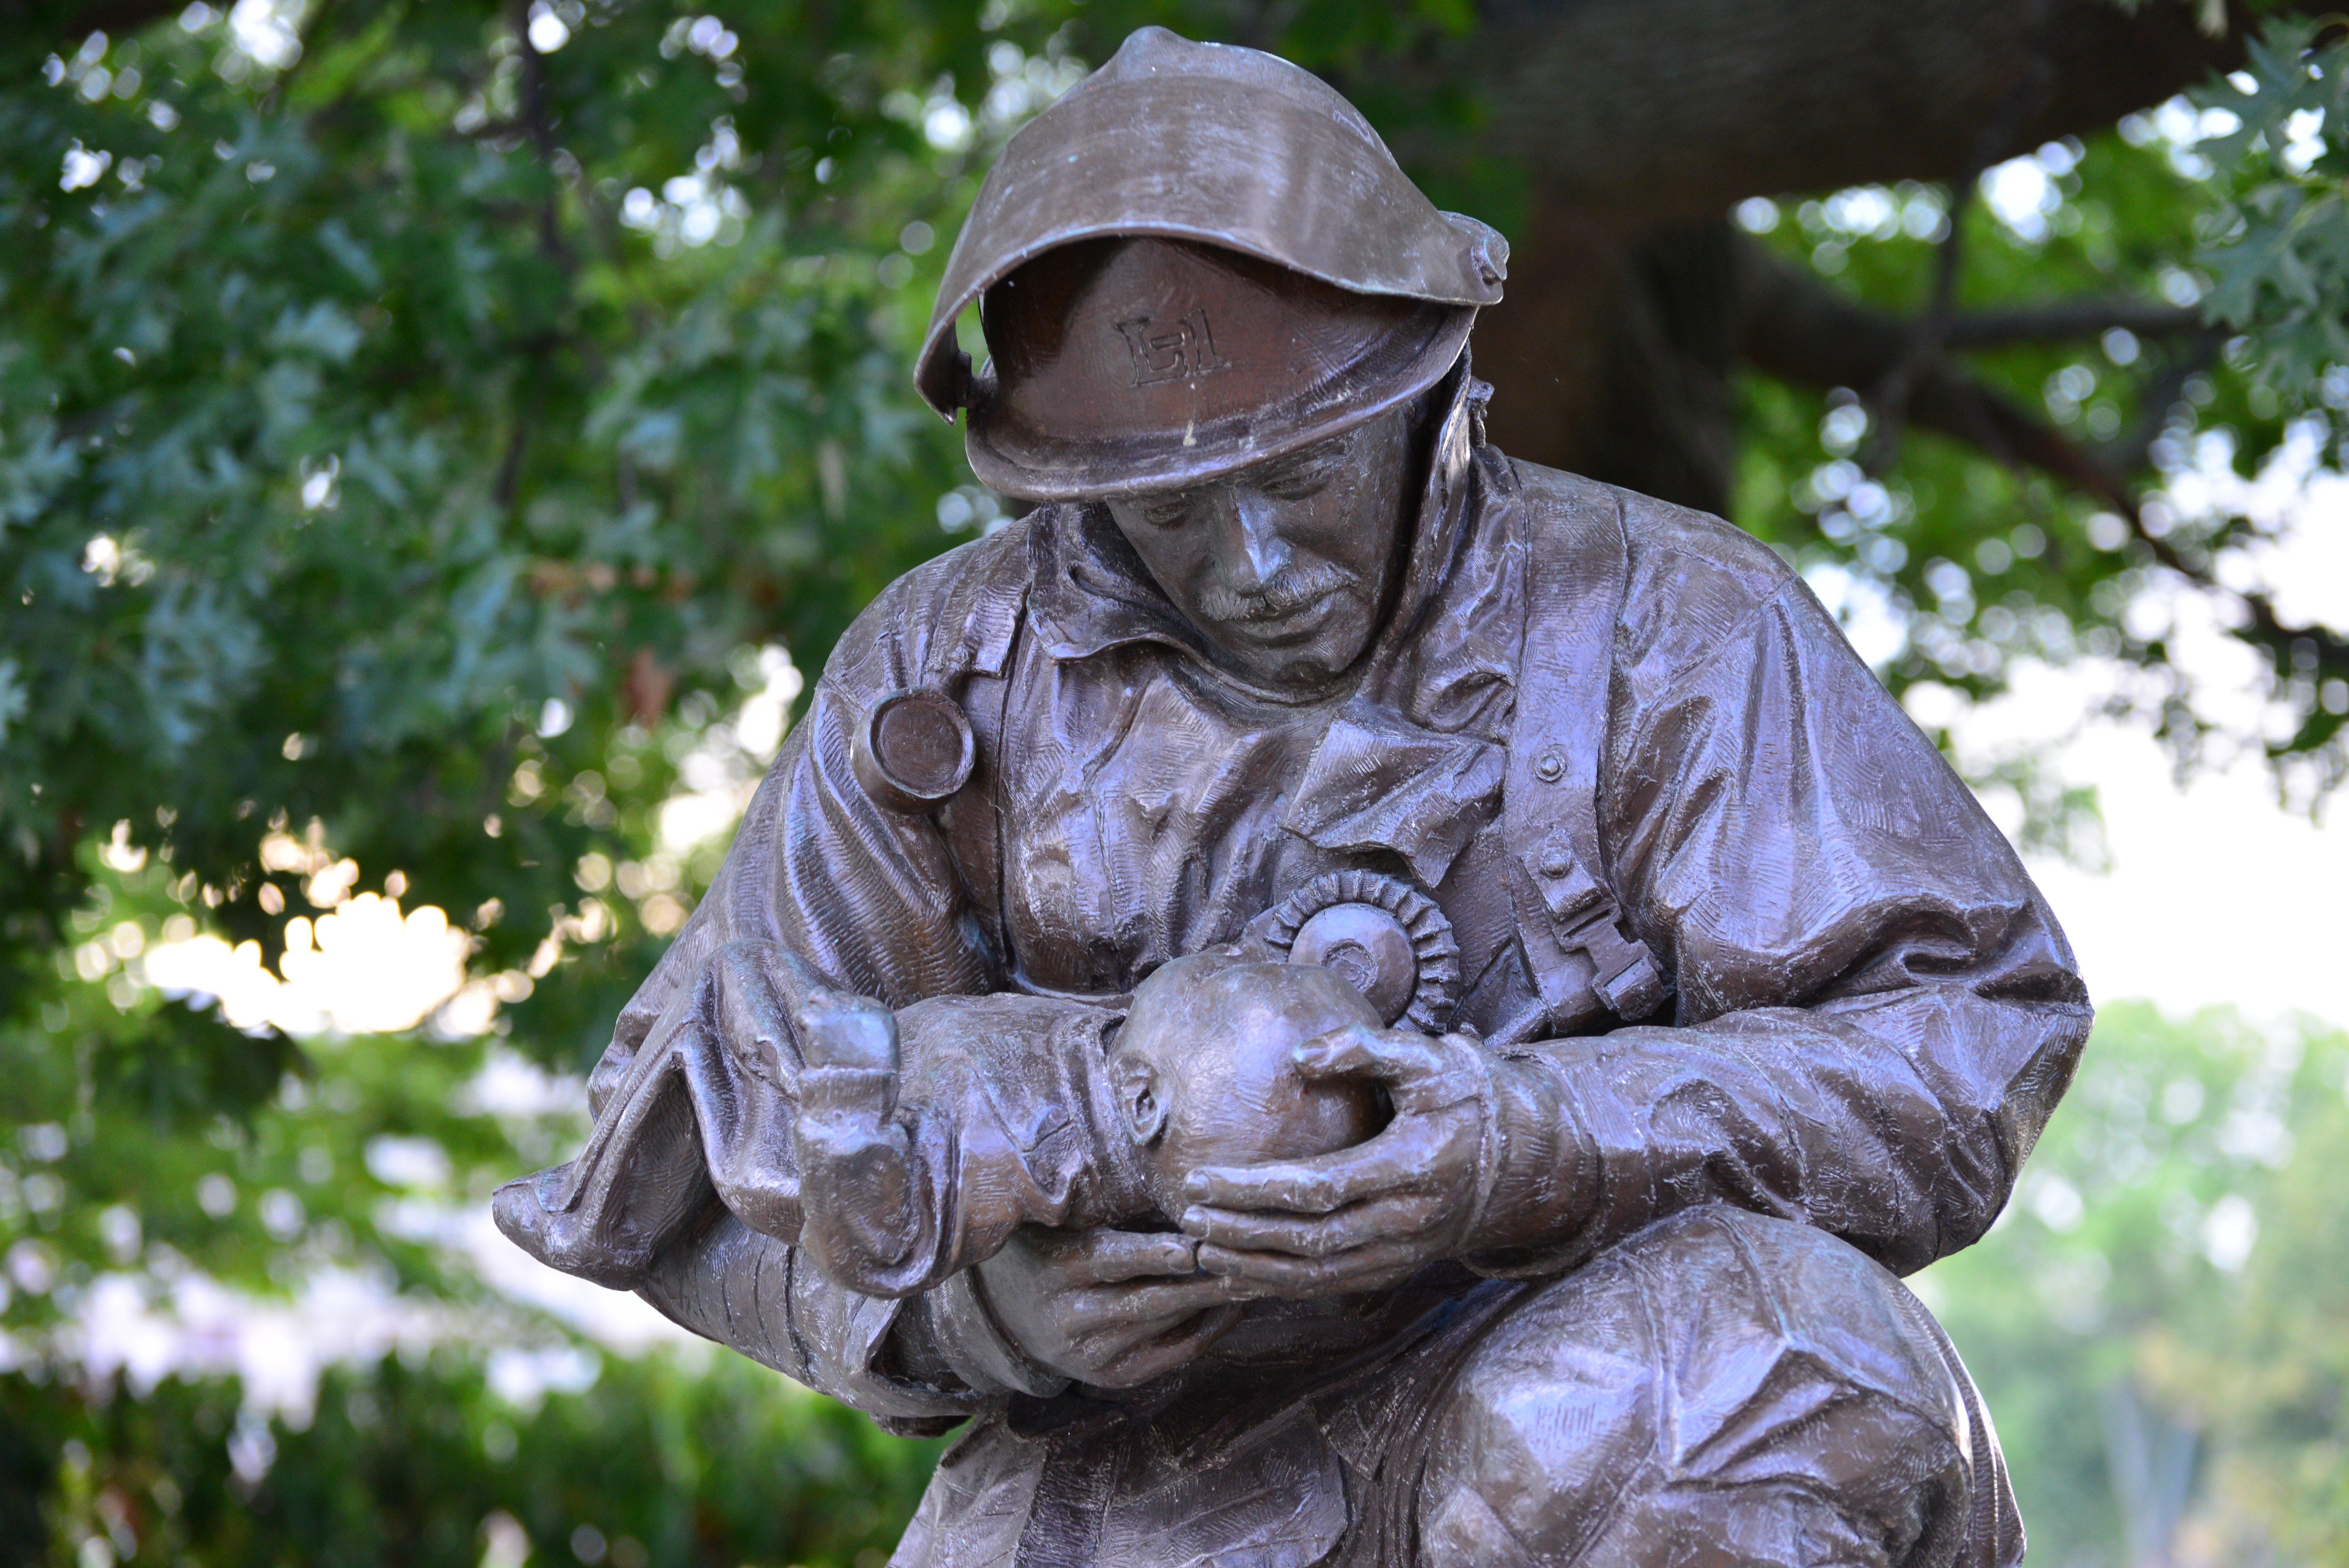 Firefighter Memorial #4 - George Danhires